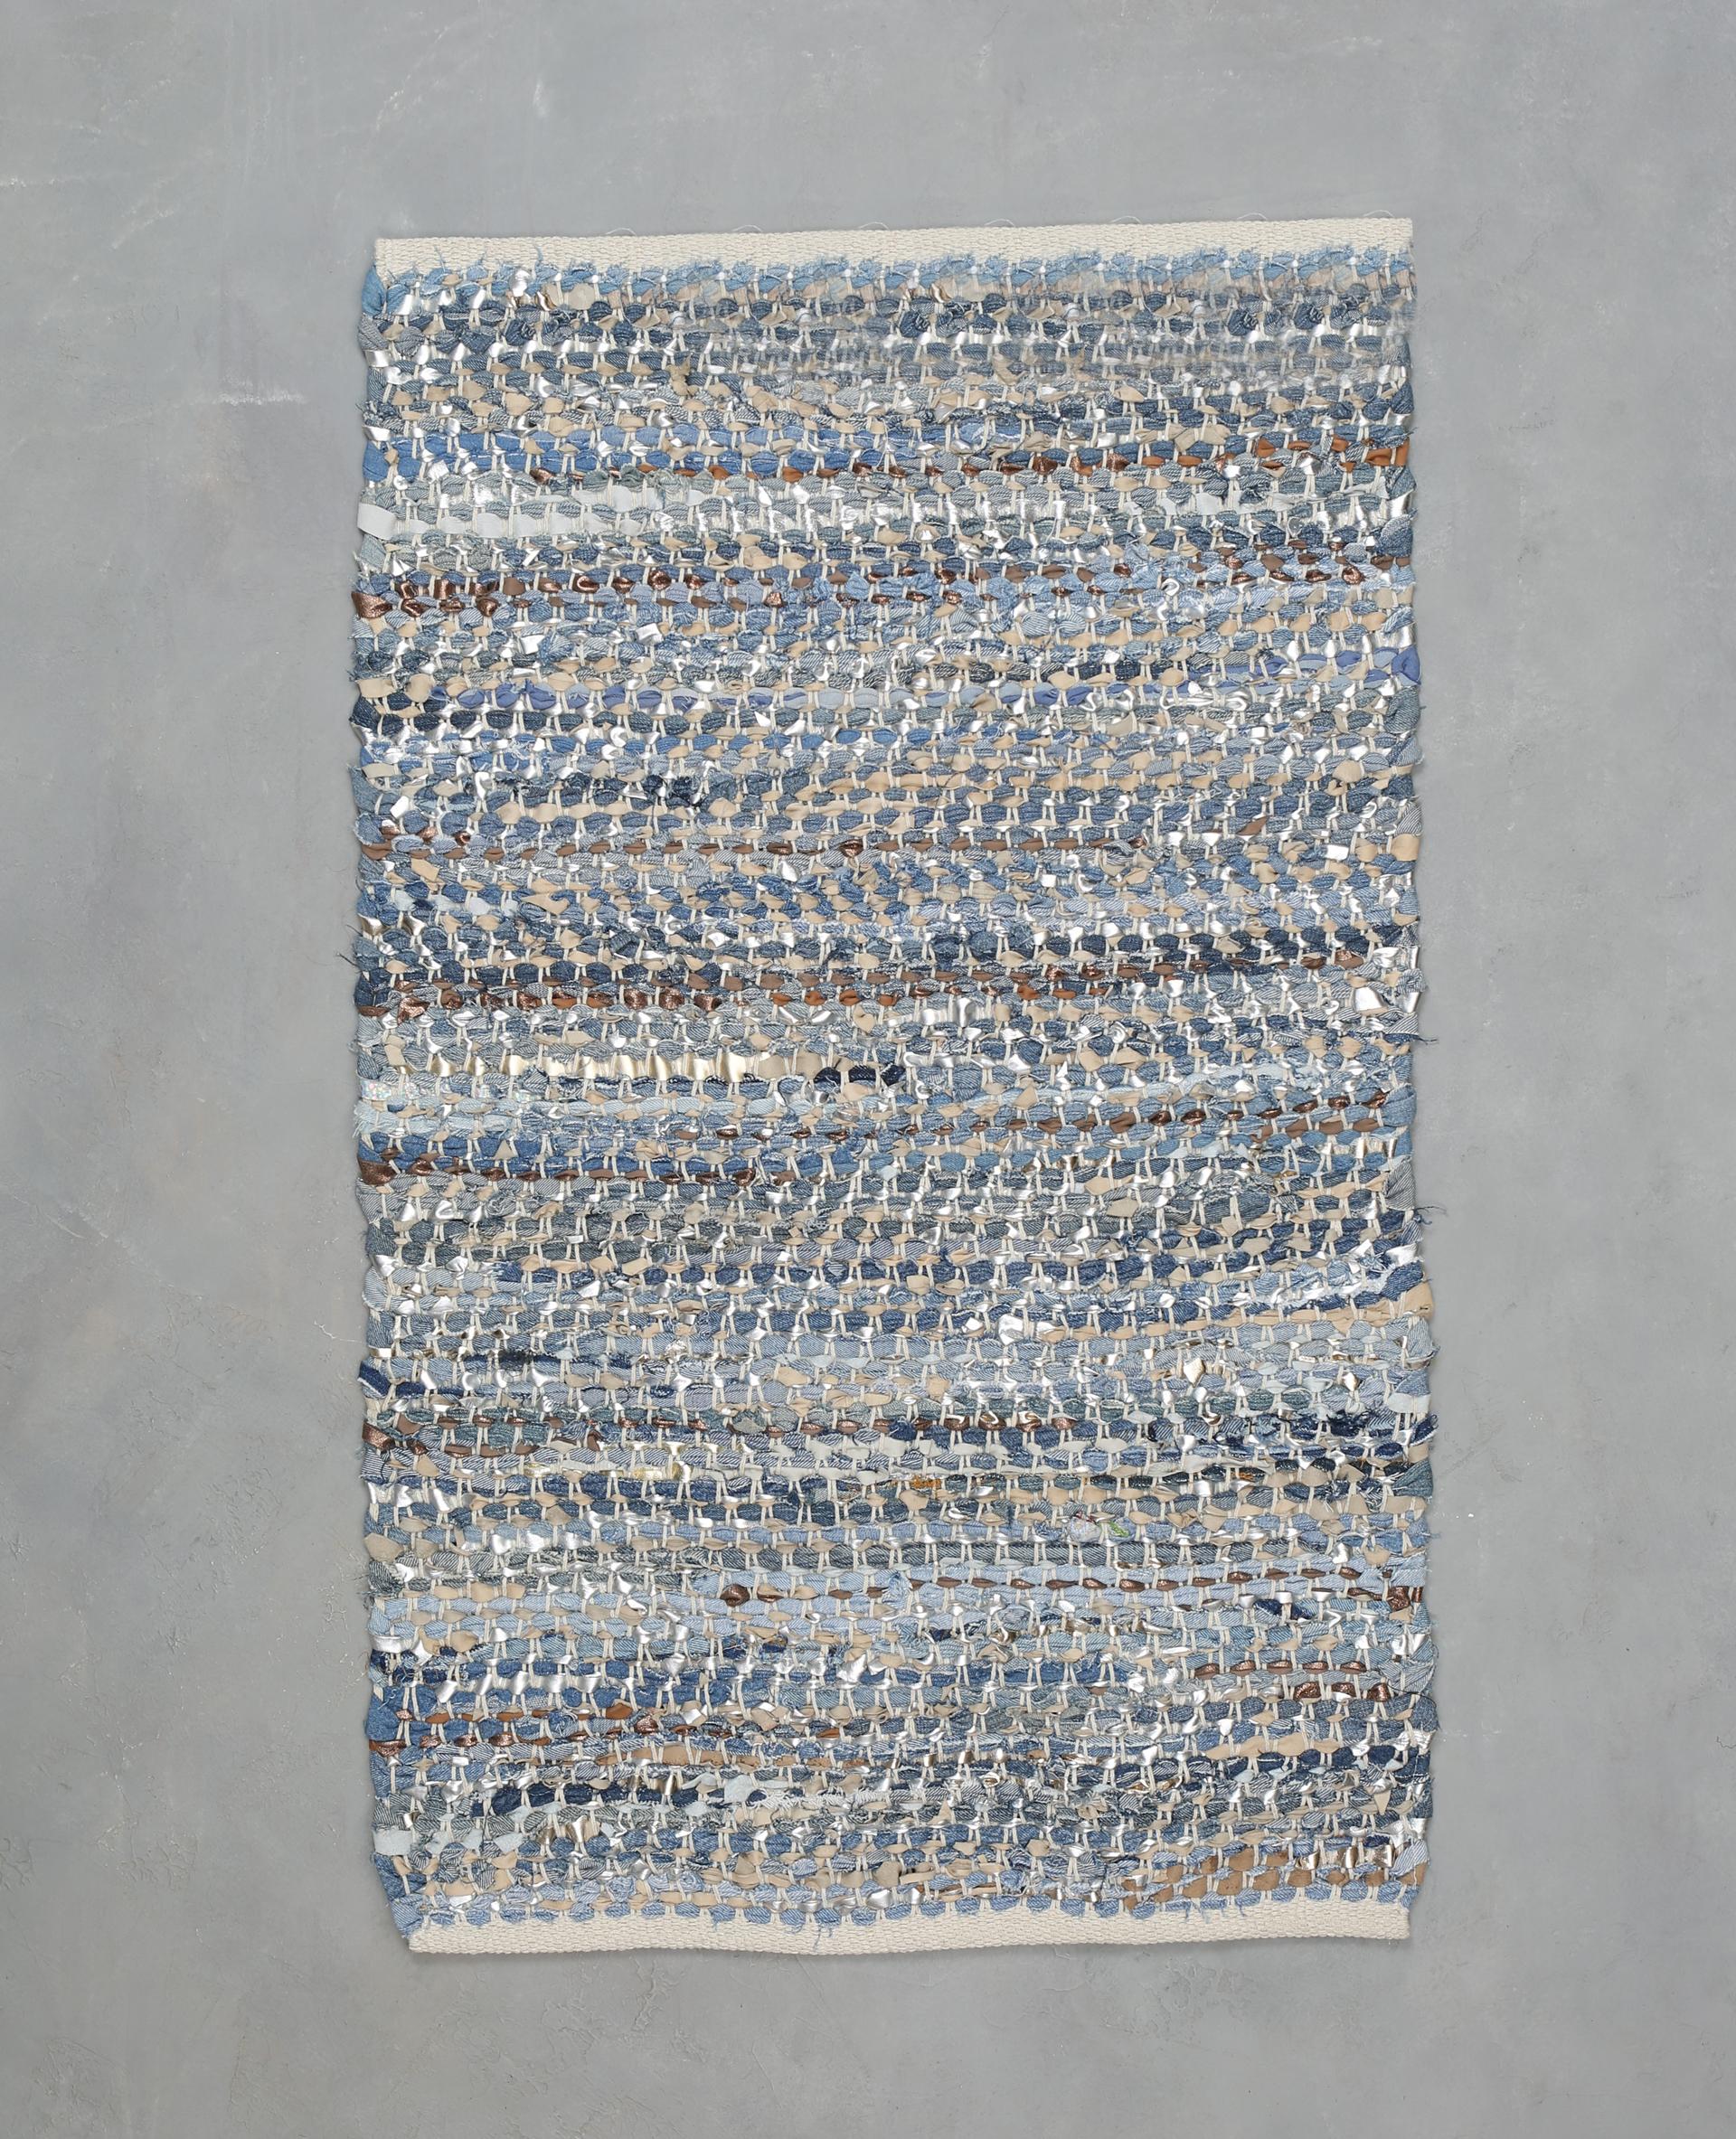 Tapis tiss en jean et simili cuir bleu 955044680g07 pimkie - Tapis en cuir ...